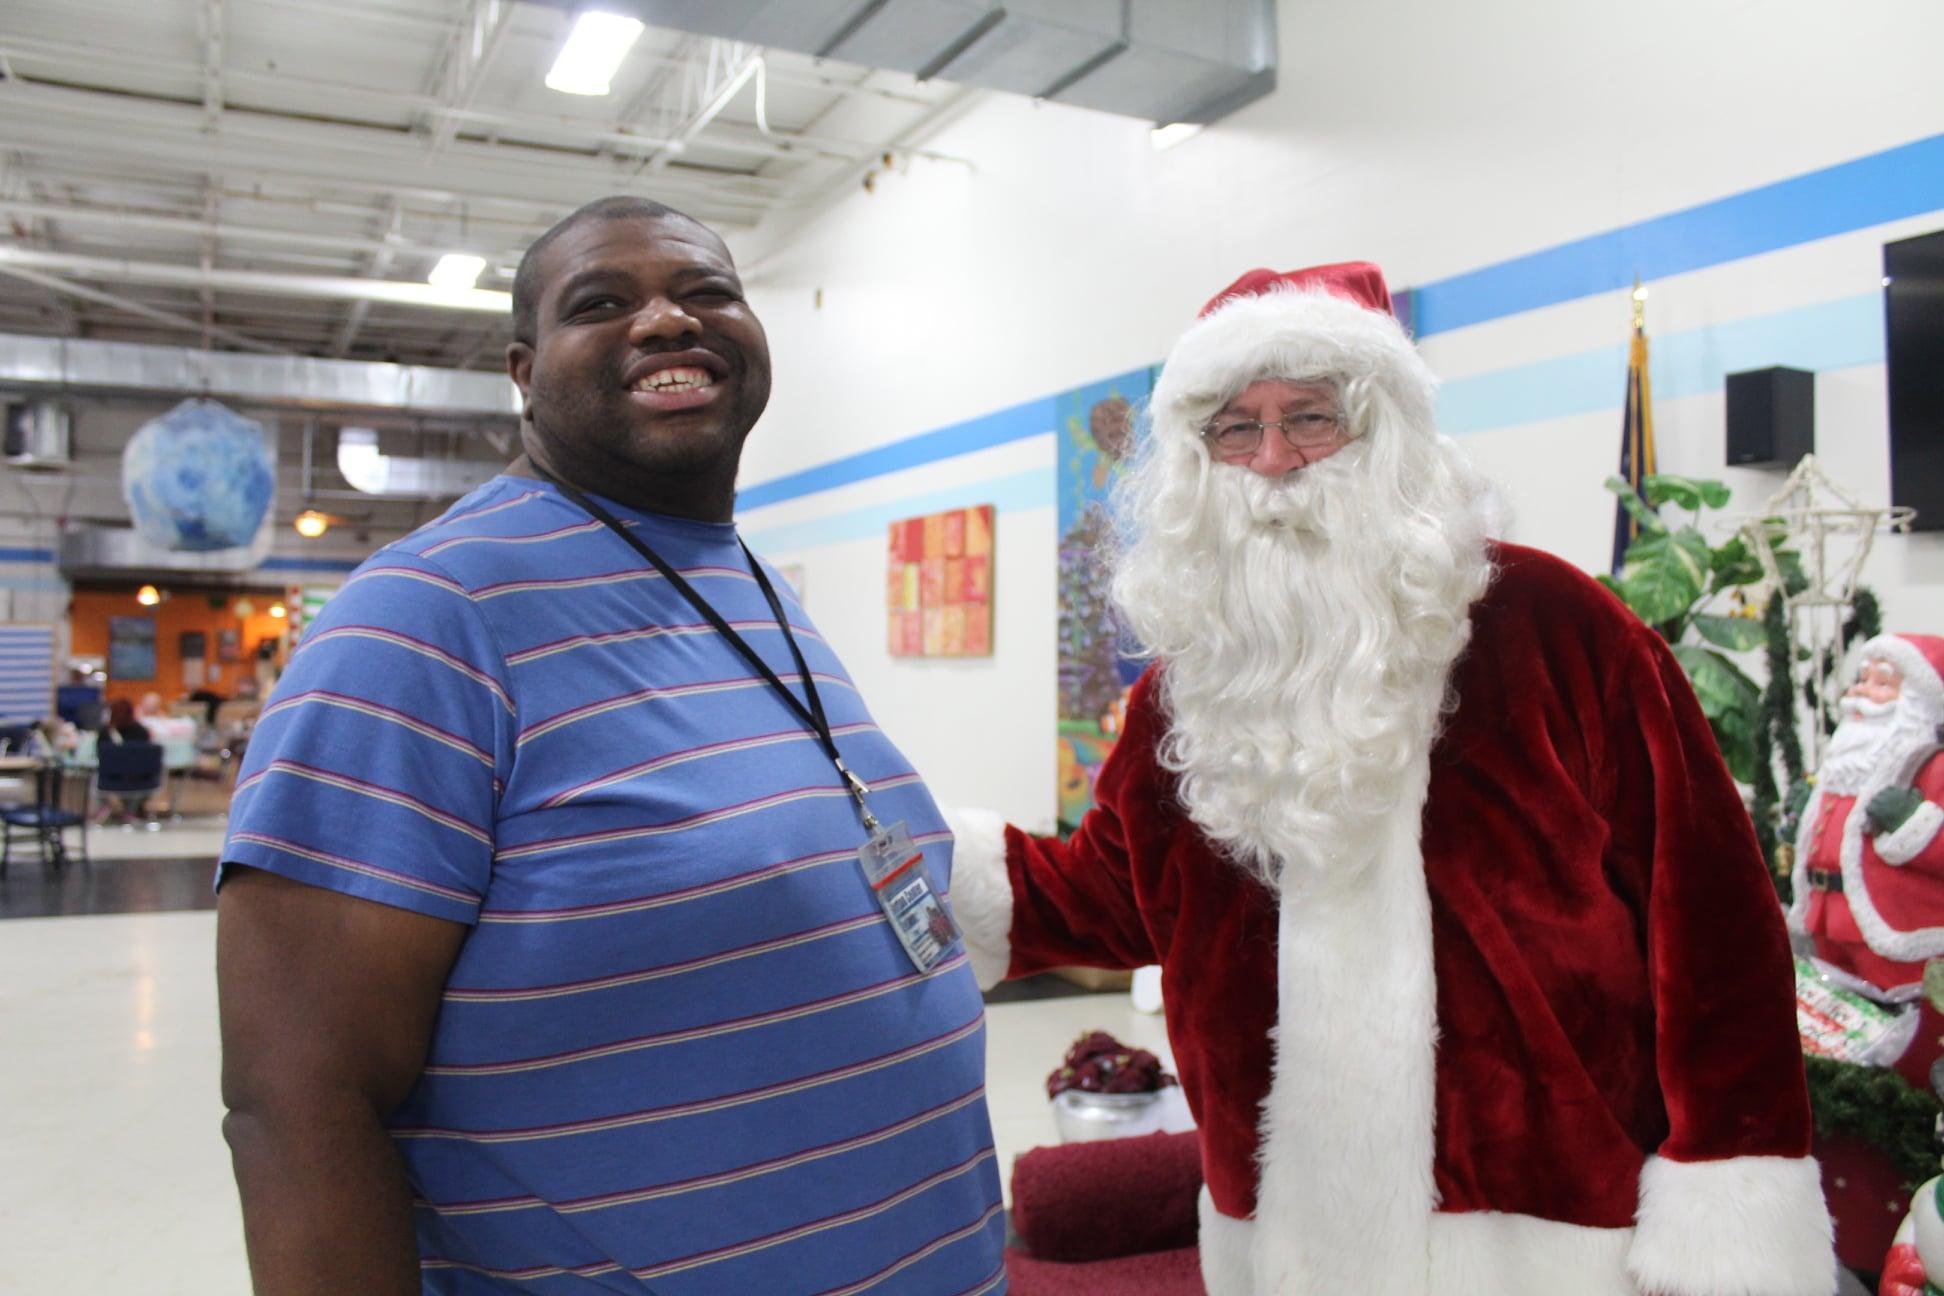 Christmas at the Burton Center